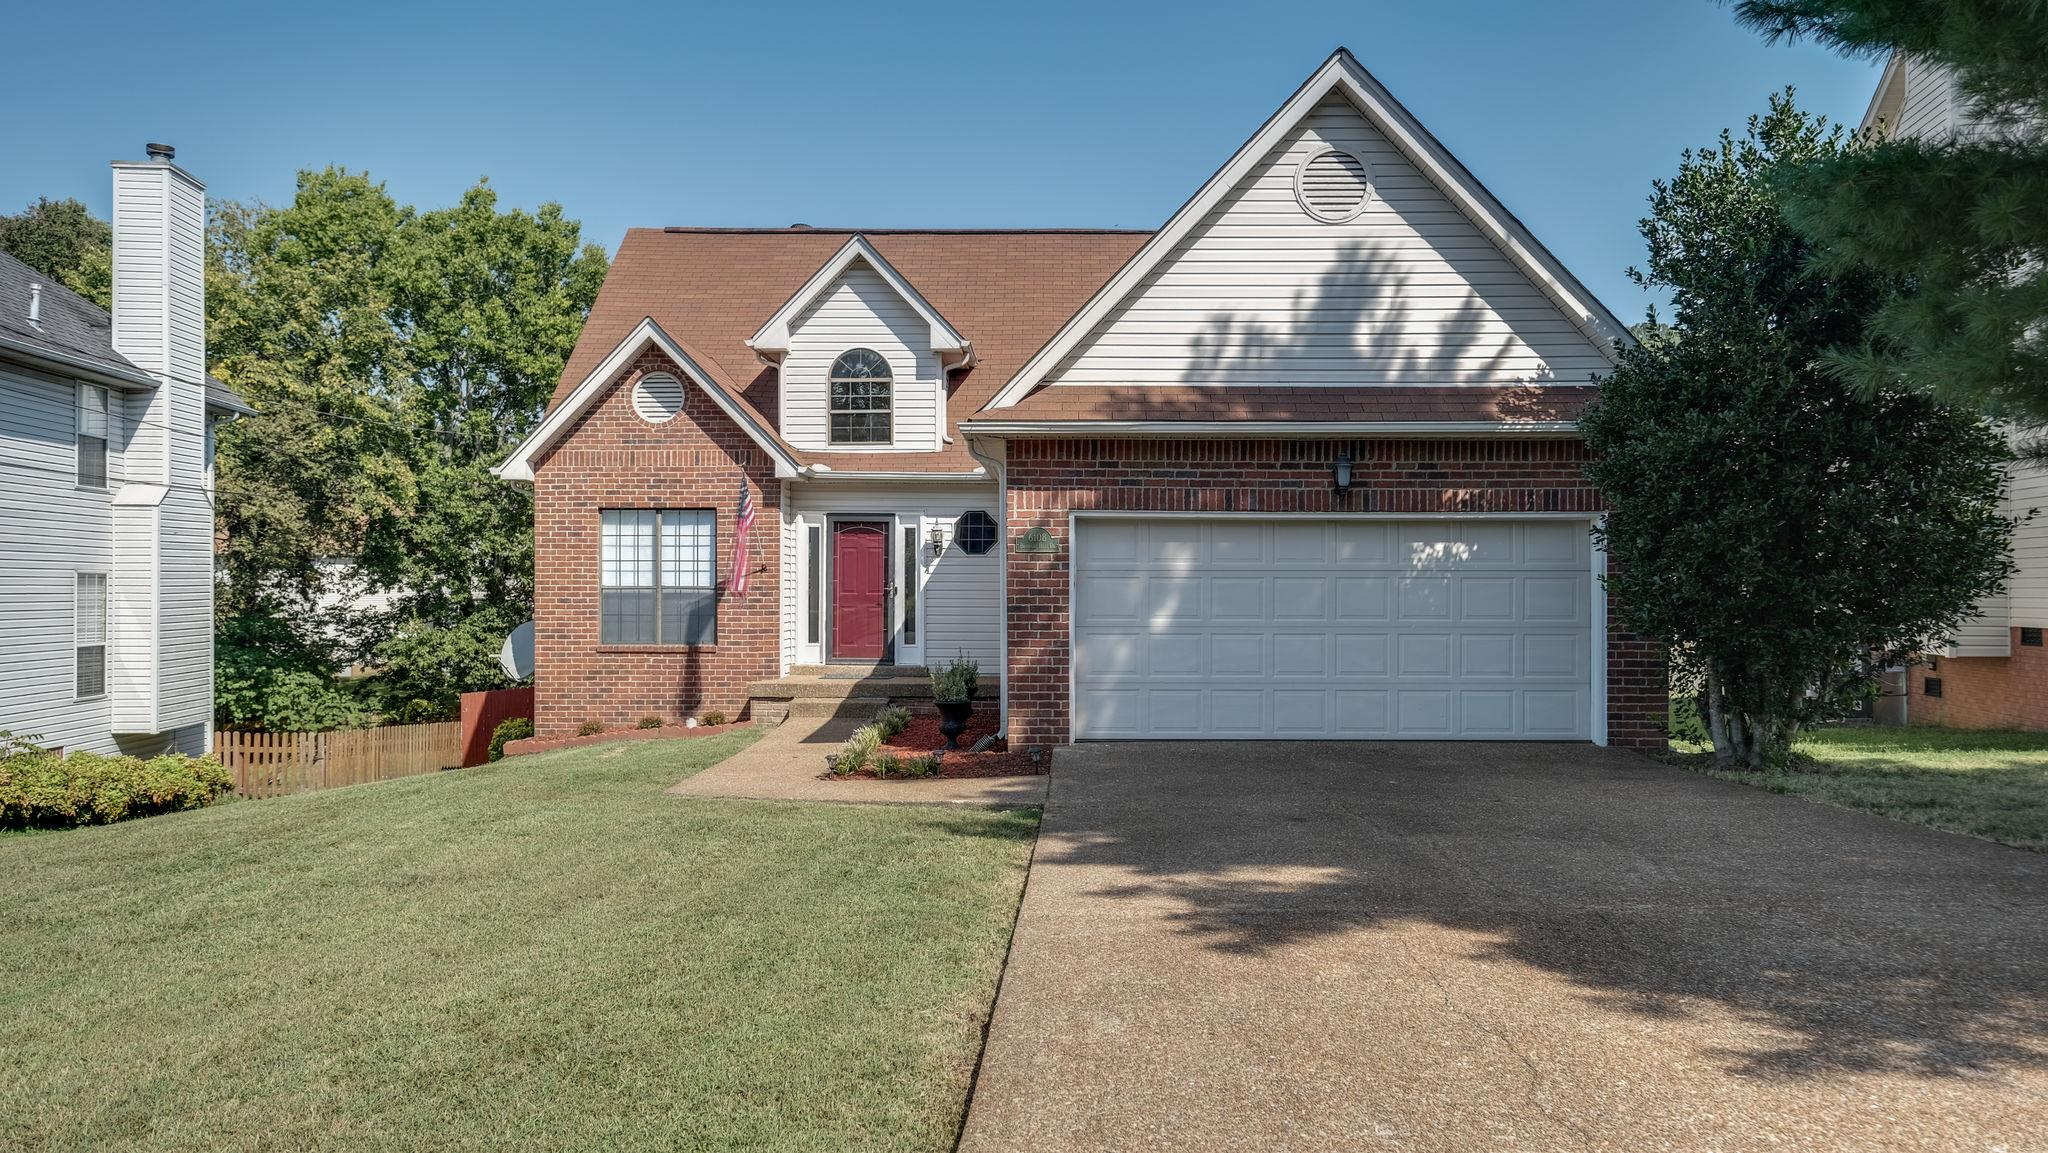 6108 Bradford Hills Dr, Nashville, TN 37211 - Nashville, TN real estate listing